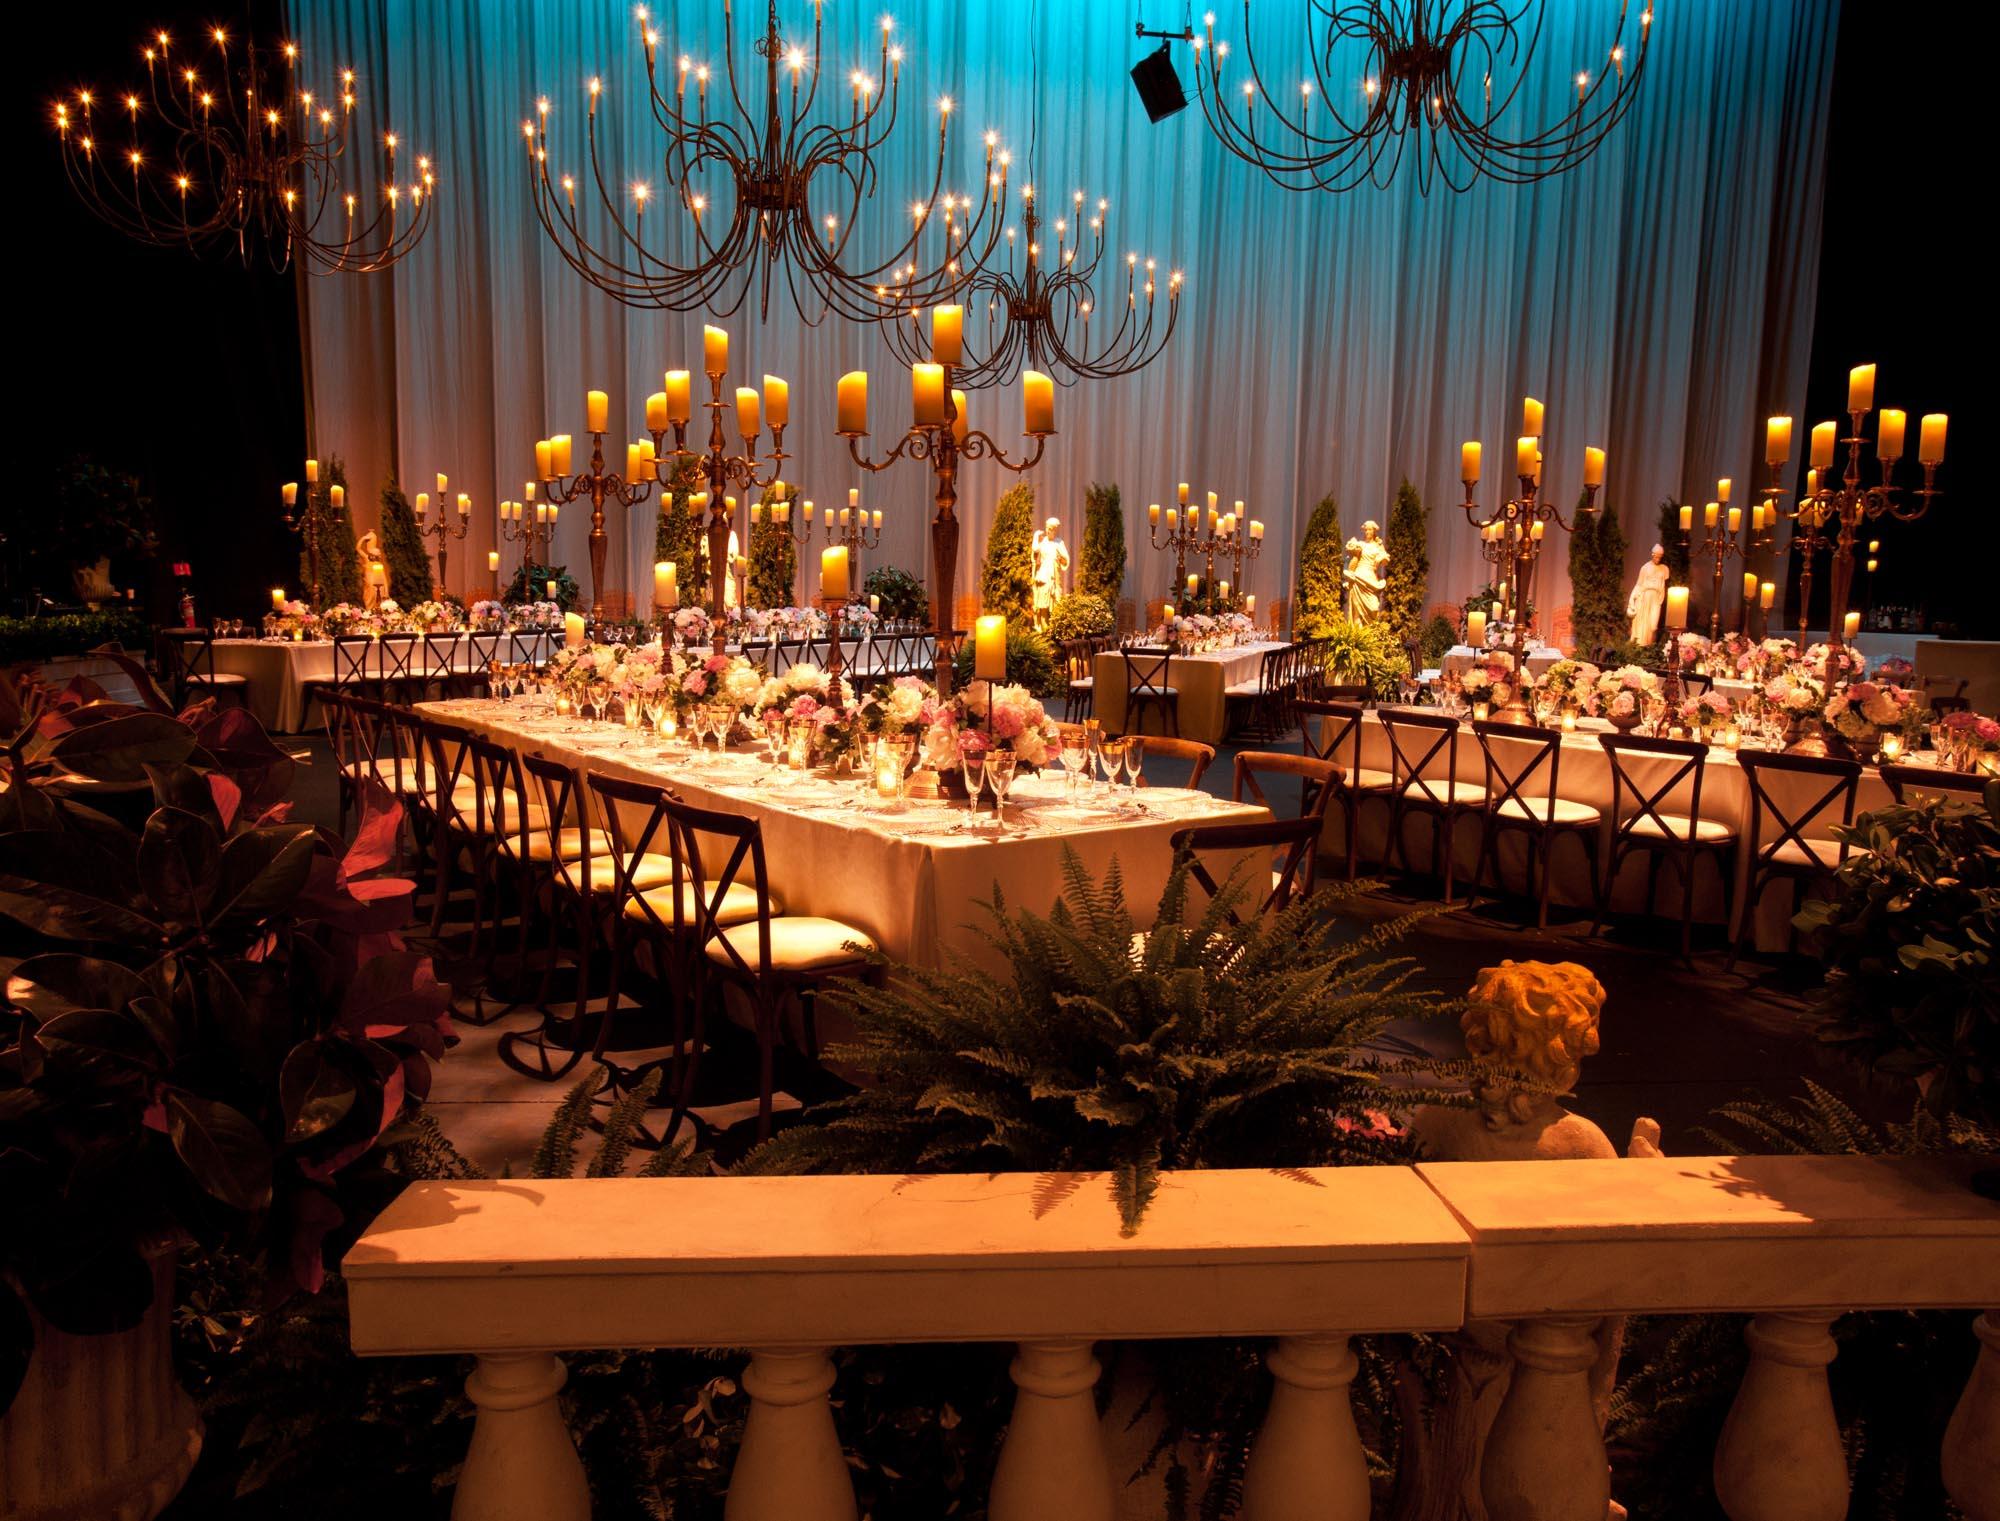 birch-bespoke-events-and-weddings-5.jpg